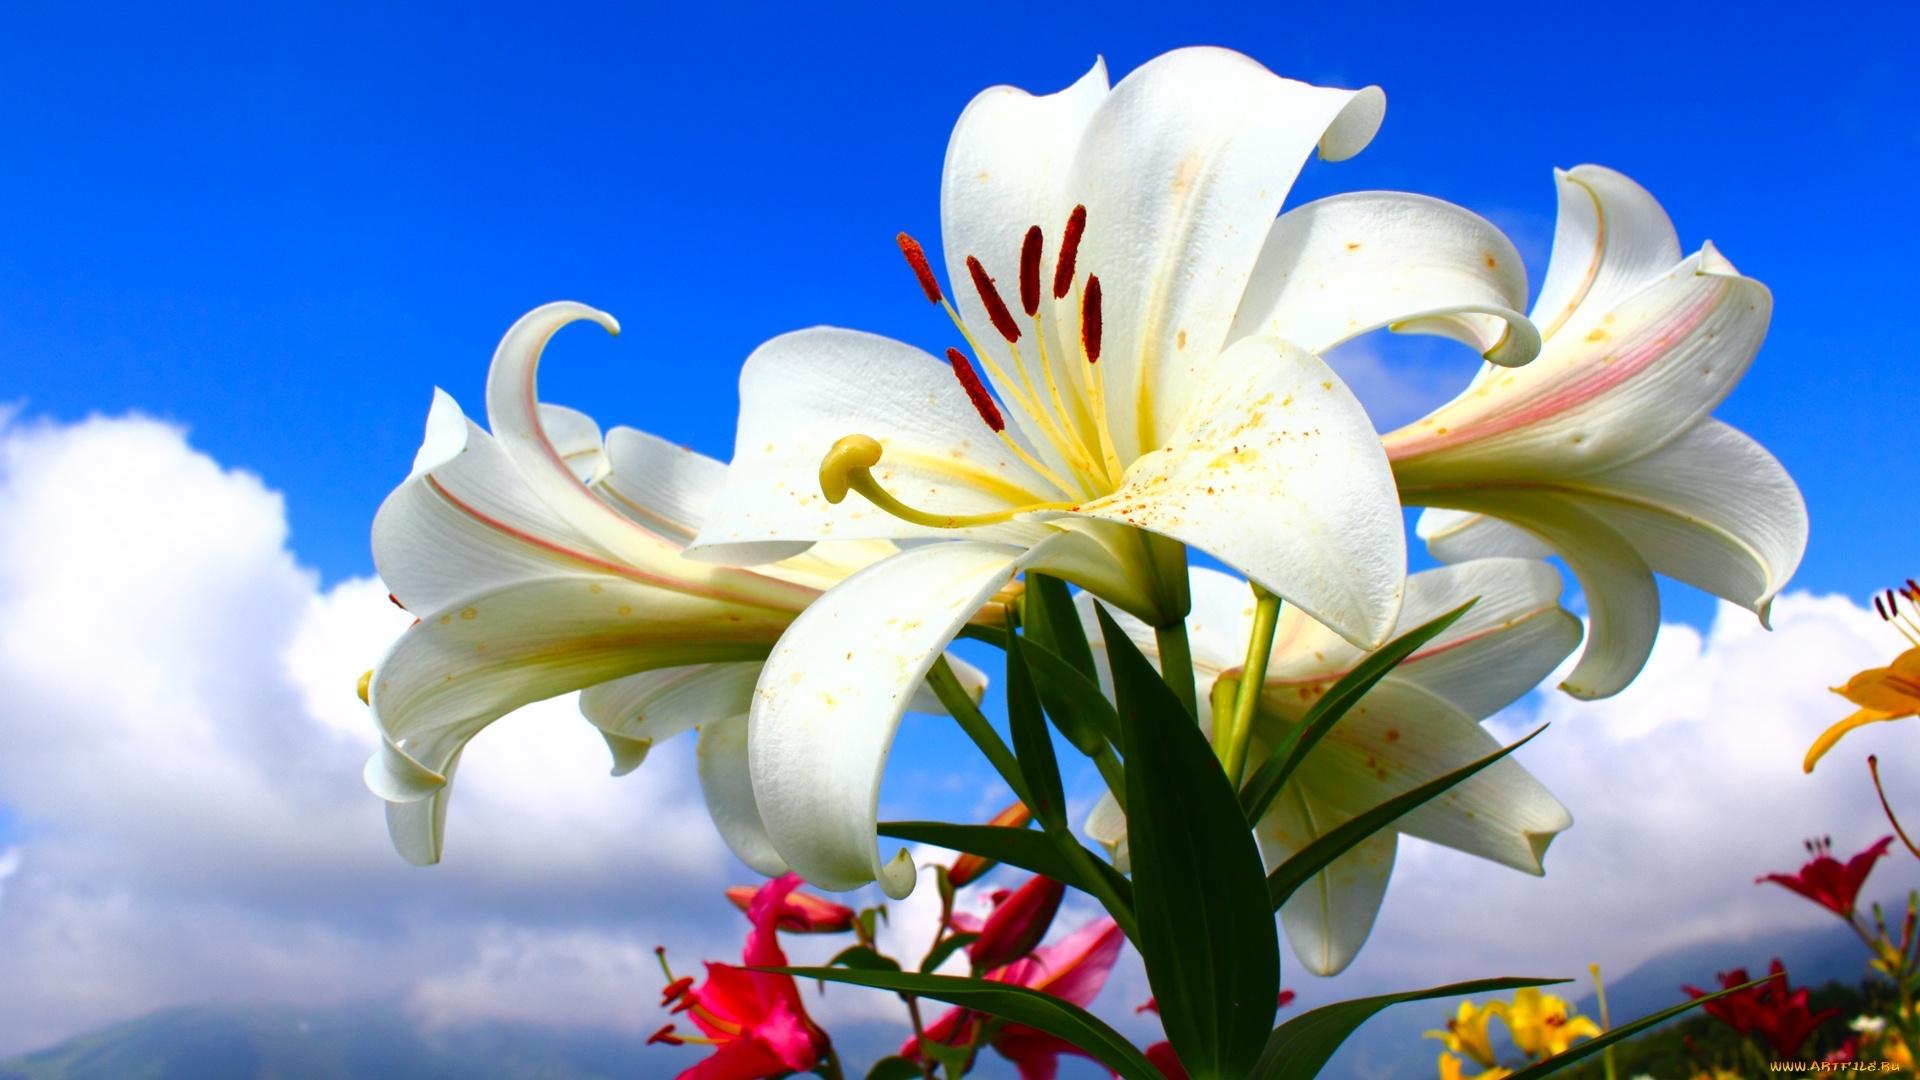 Lily Flower wallpaper photo hd